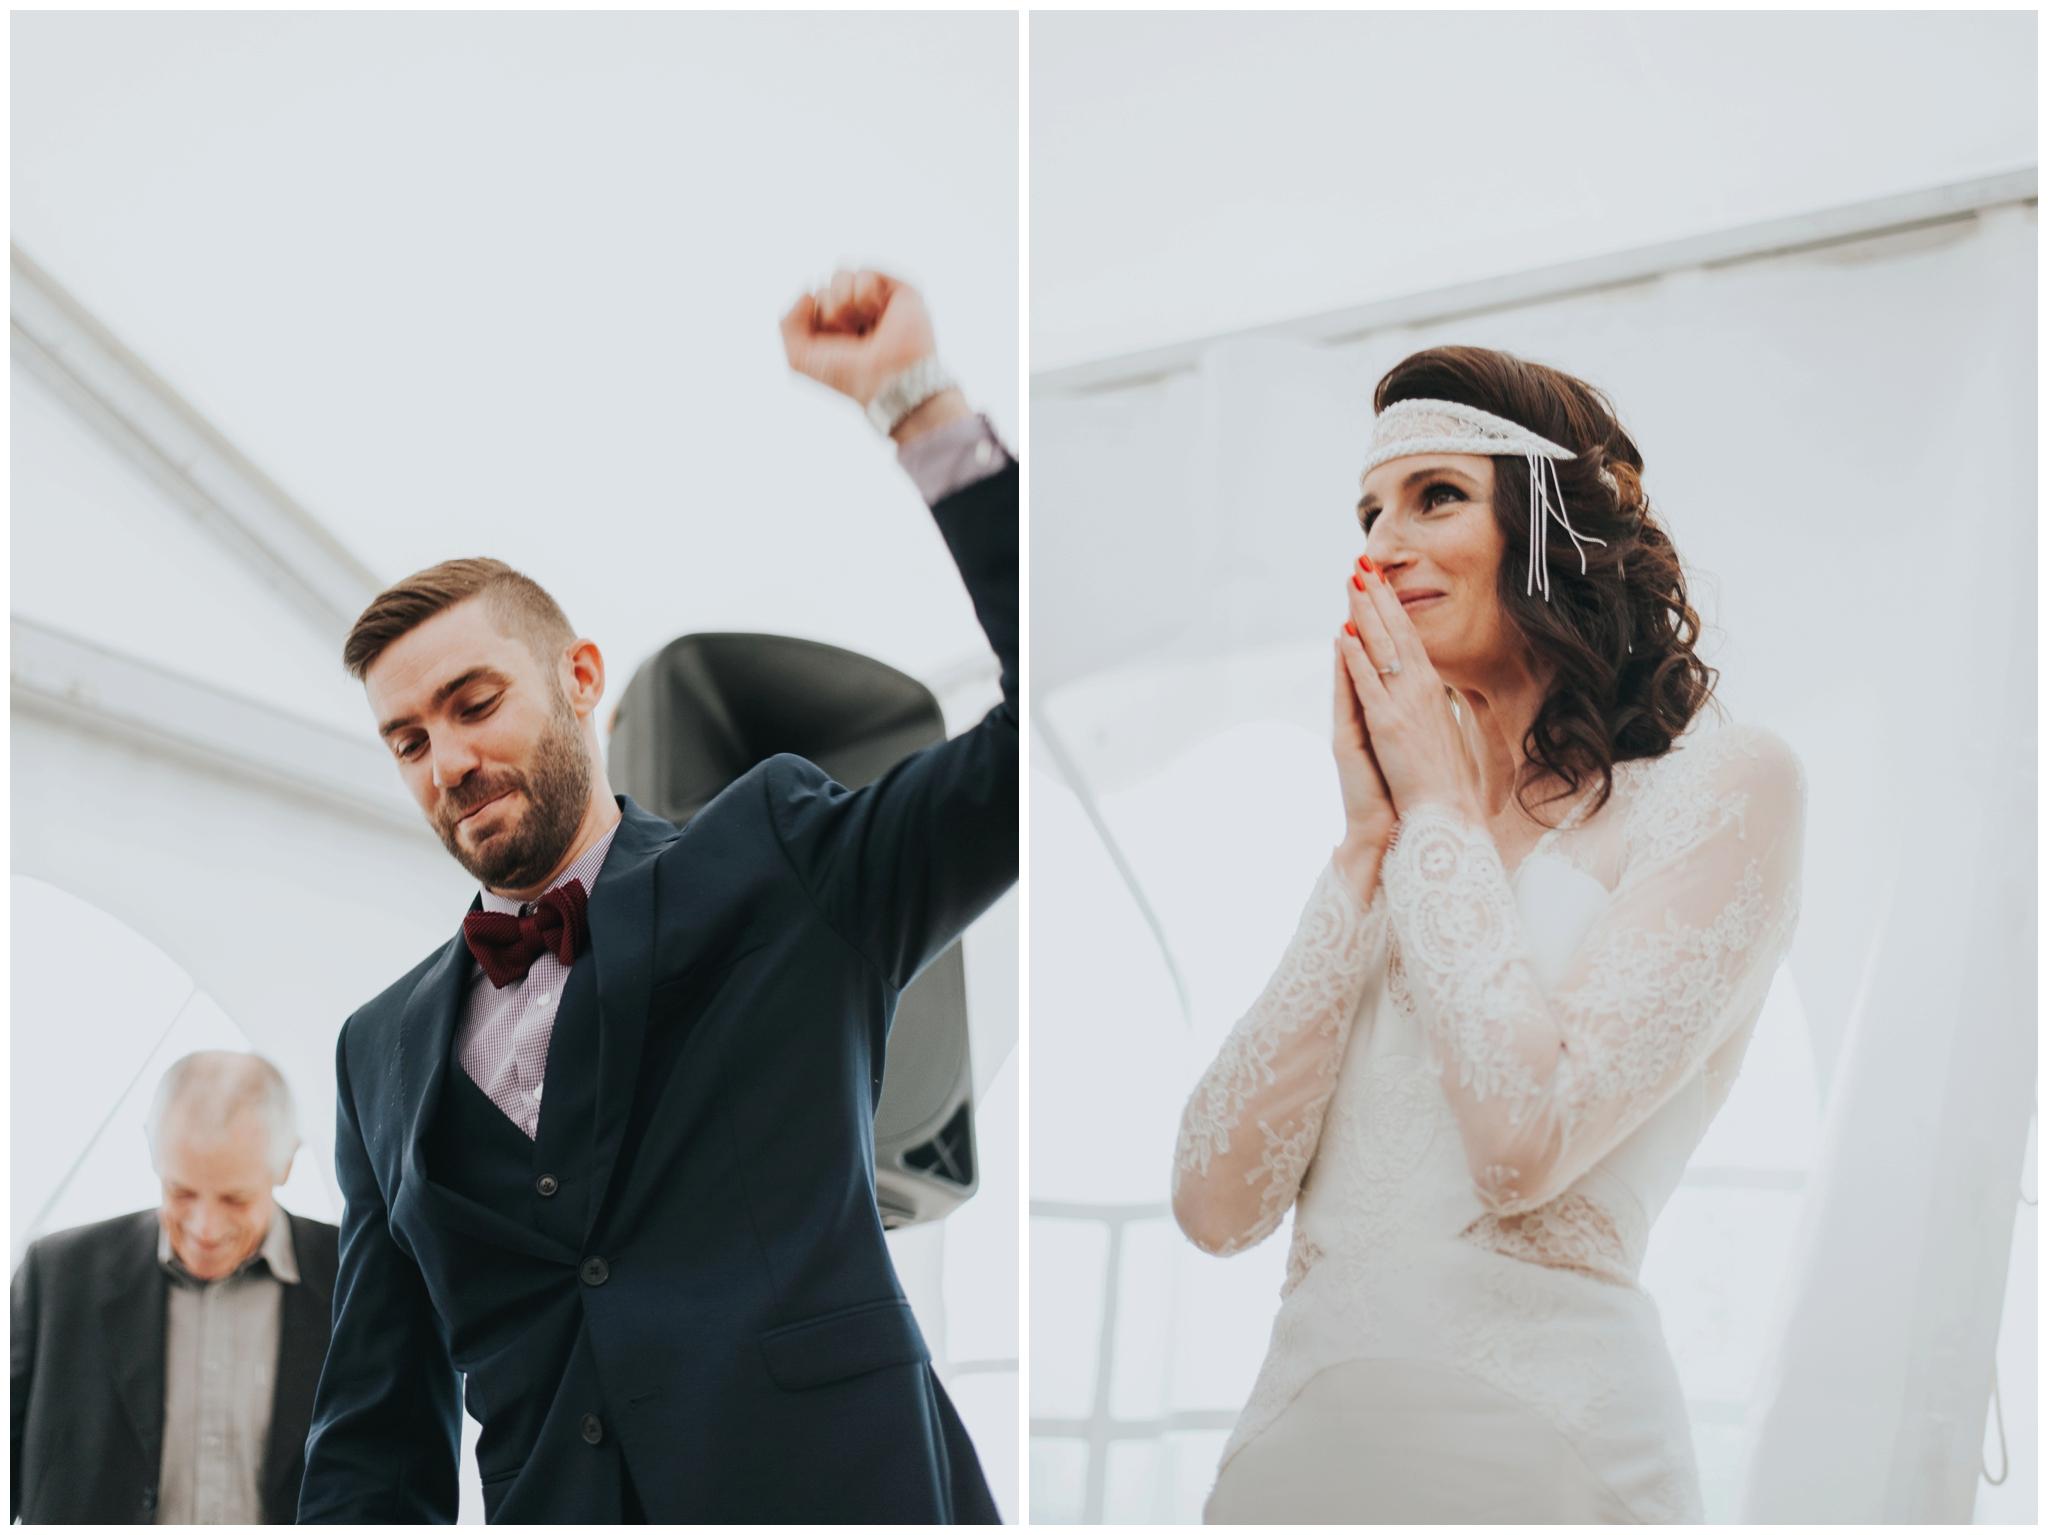 photographe-mariage-montagne-vercors-boho-folk-grenoble-annecy-alpes_0049